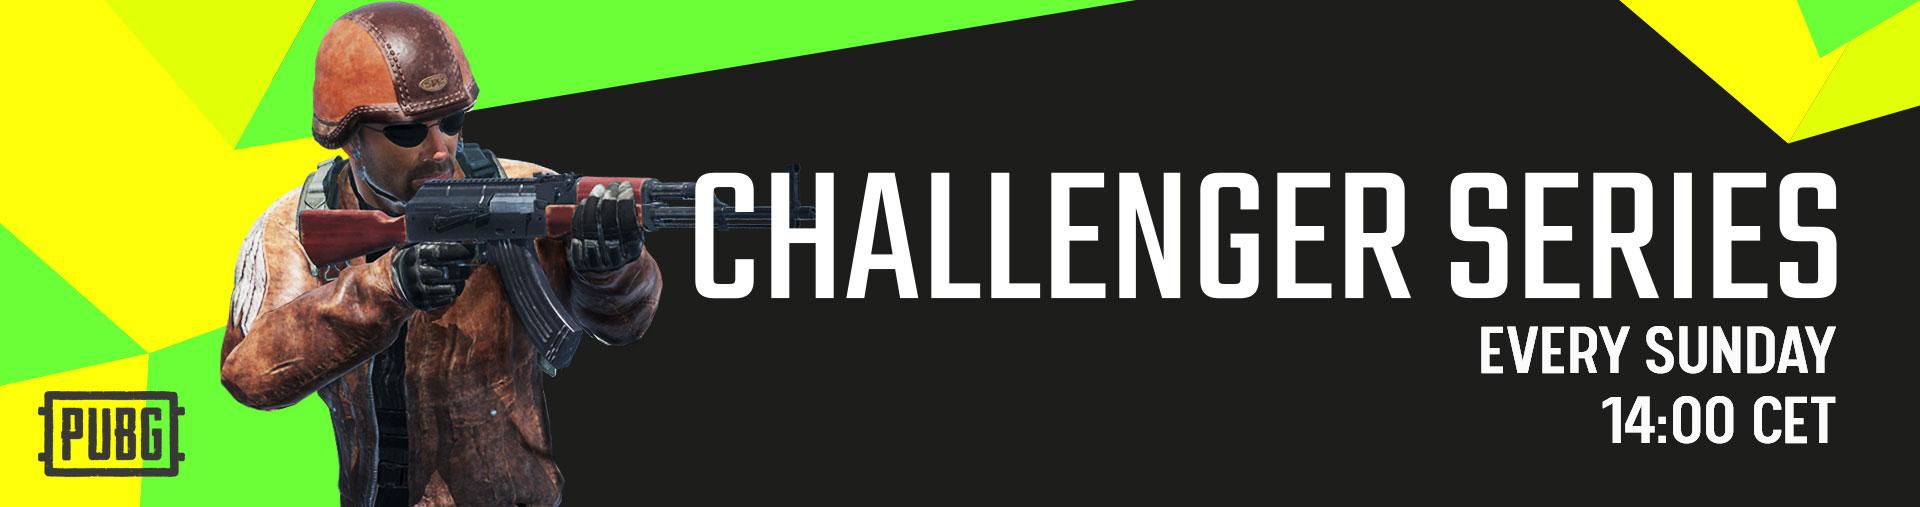 Challenger Series Banner